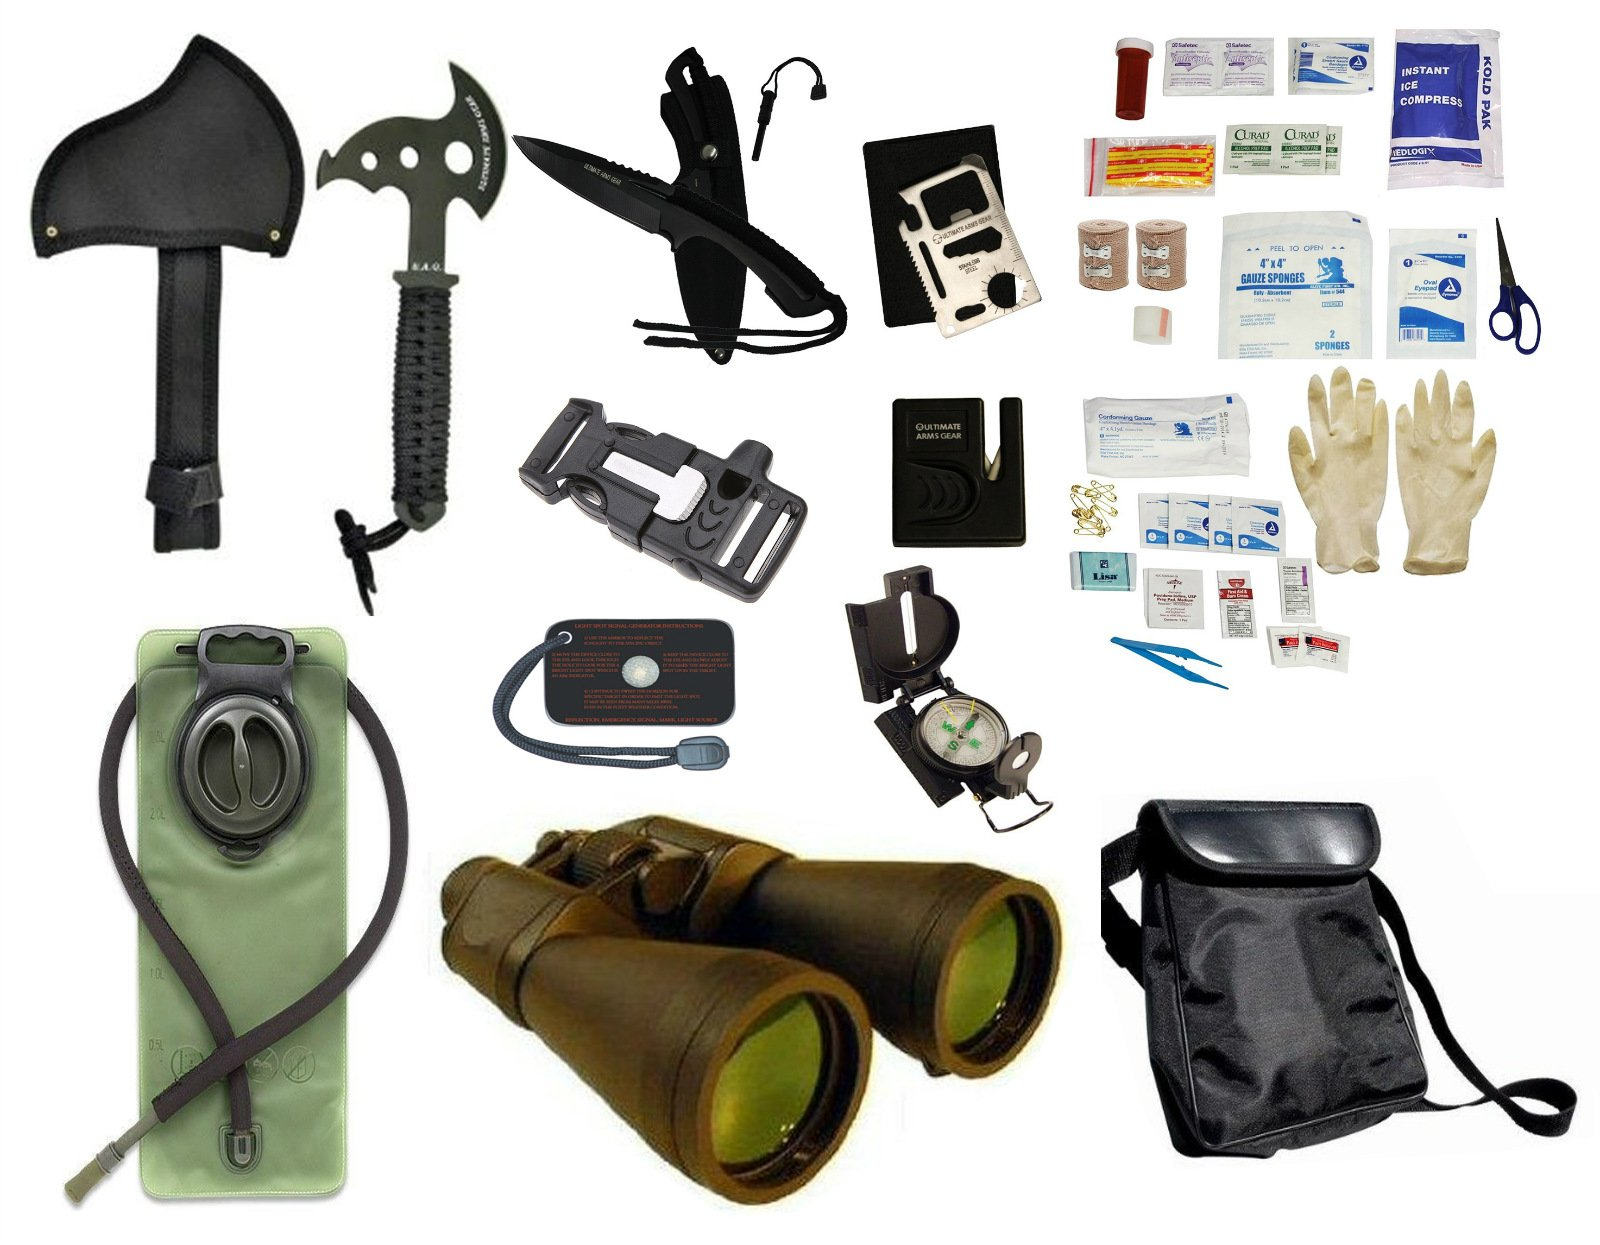 Survival Camping Hiking Kit: Emergency First Aid, 20X70 Binoculars Green,Sharpener, Axe, Fire Starter Blade, Whistle Flint Striker Belt Buckle, Hydration Bladder, Multi Tool, Compass, Signal Mirror